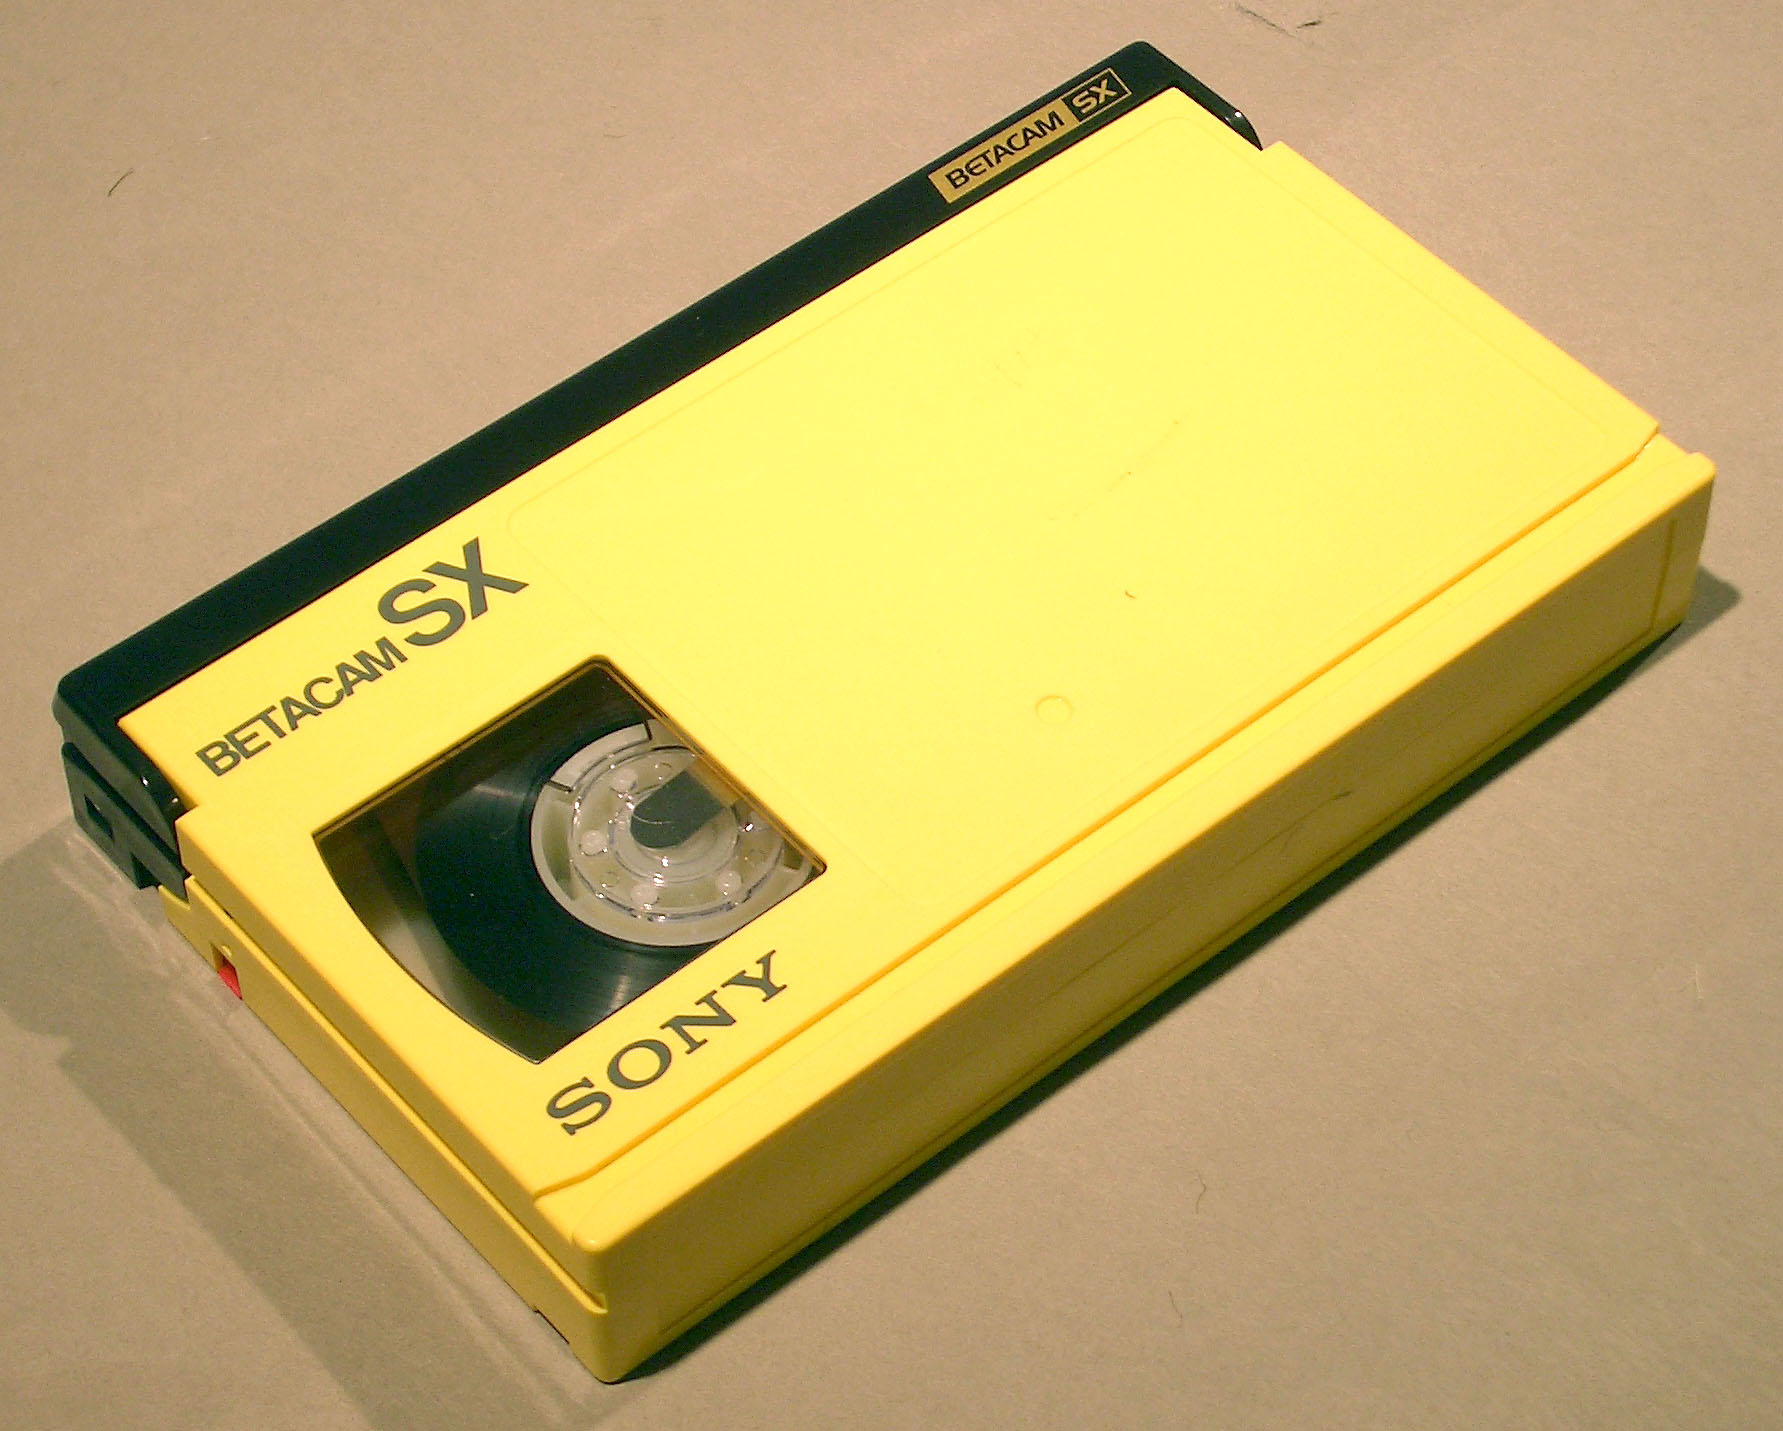 VHS vs All Beta-SX